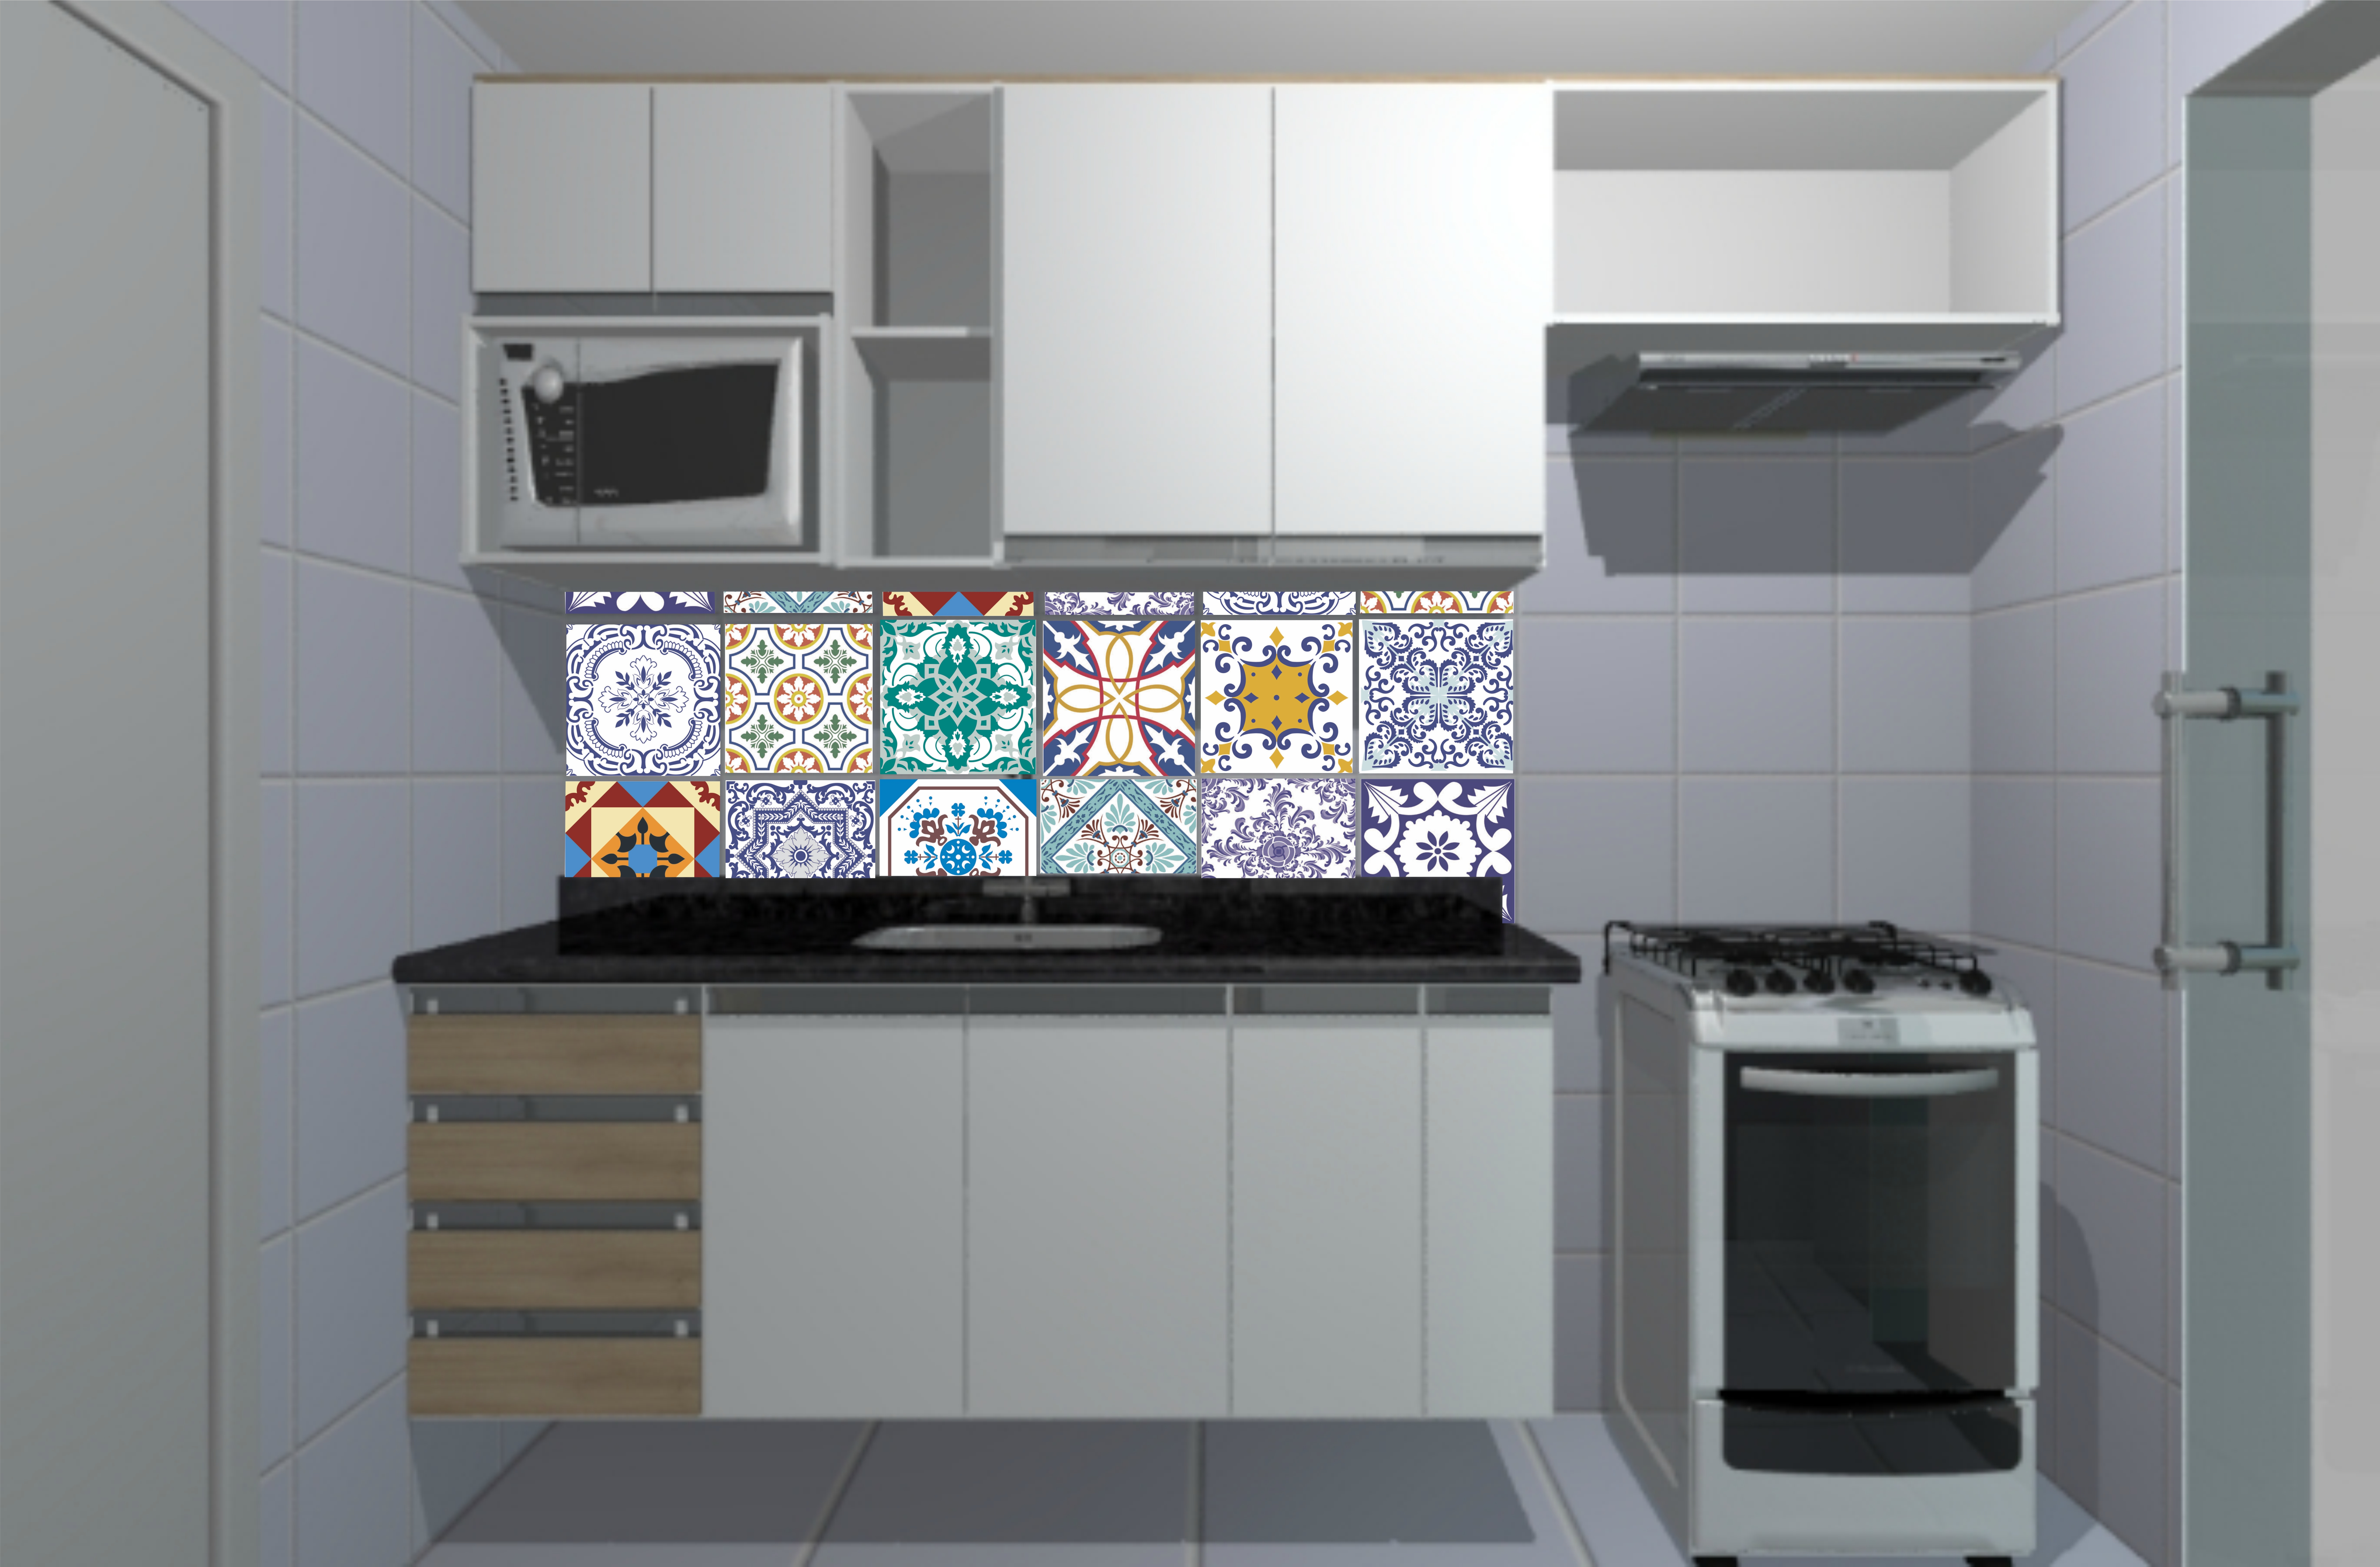 Azulejo Português Adesivo  Aarte Decoor  Elo7 # Azulejo Cozinha Horizontal